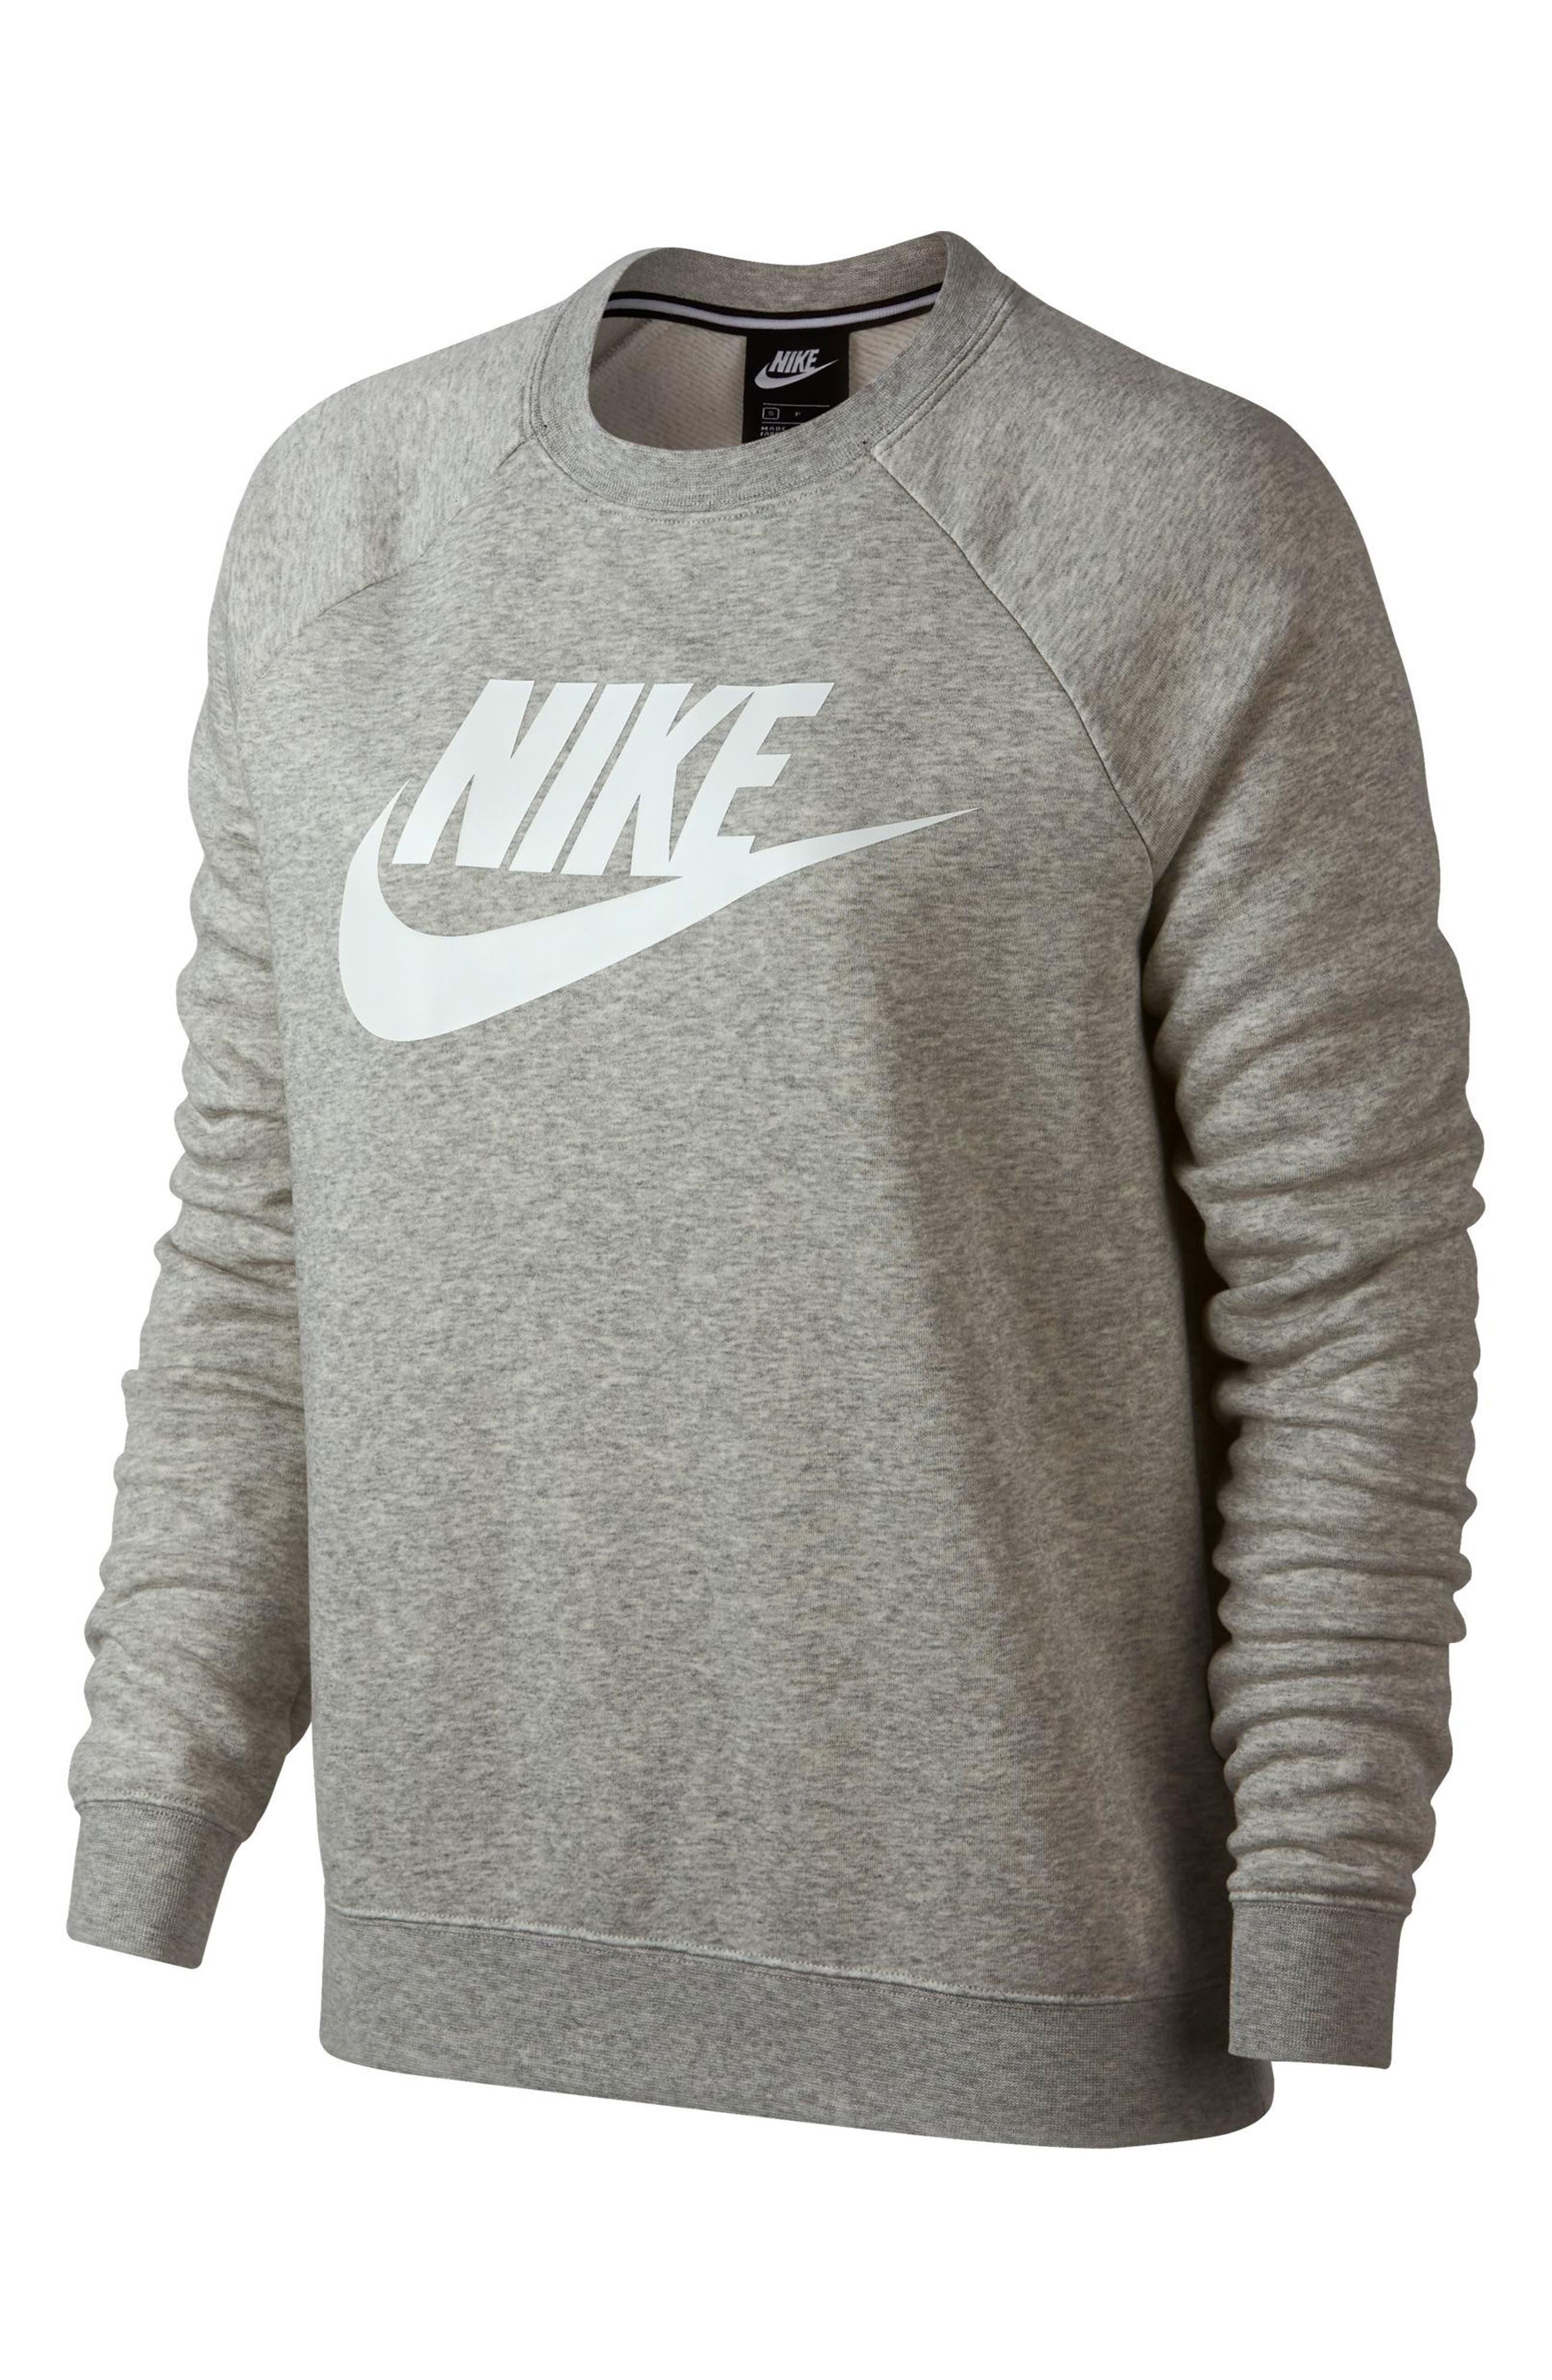 Nordstrom Hoodies Women's Sweatshirts Grey amp; 0B0IAx